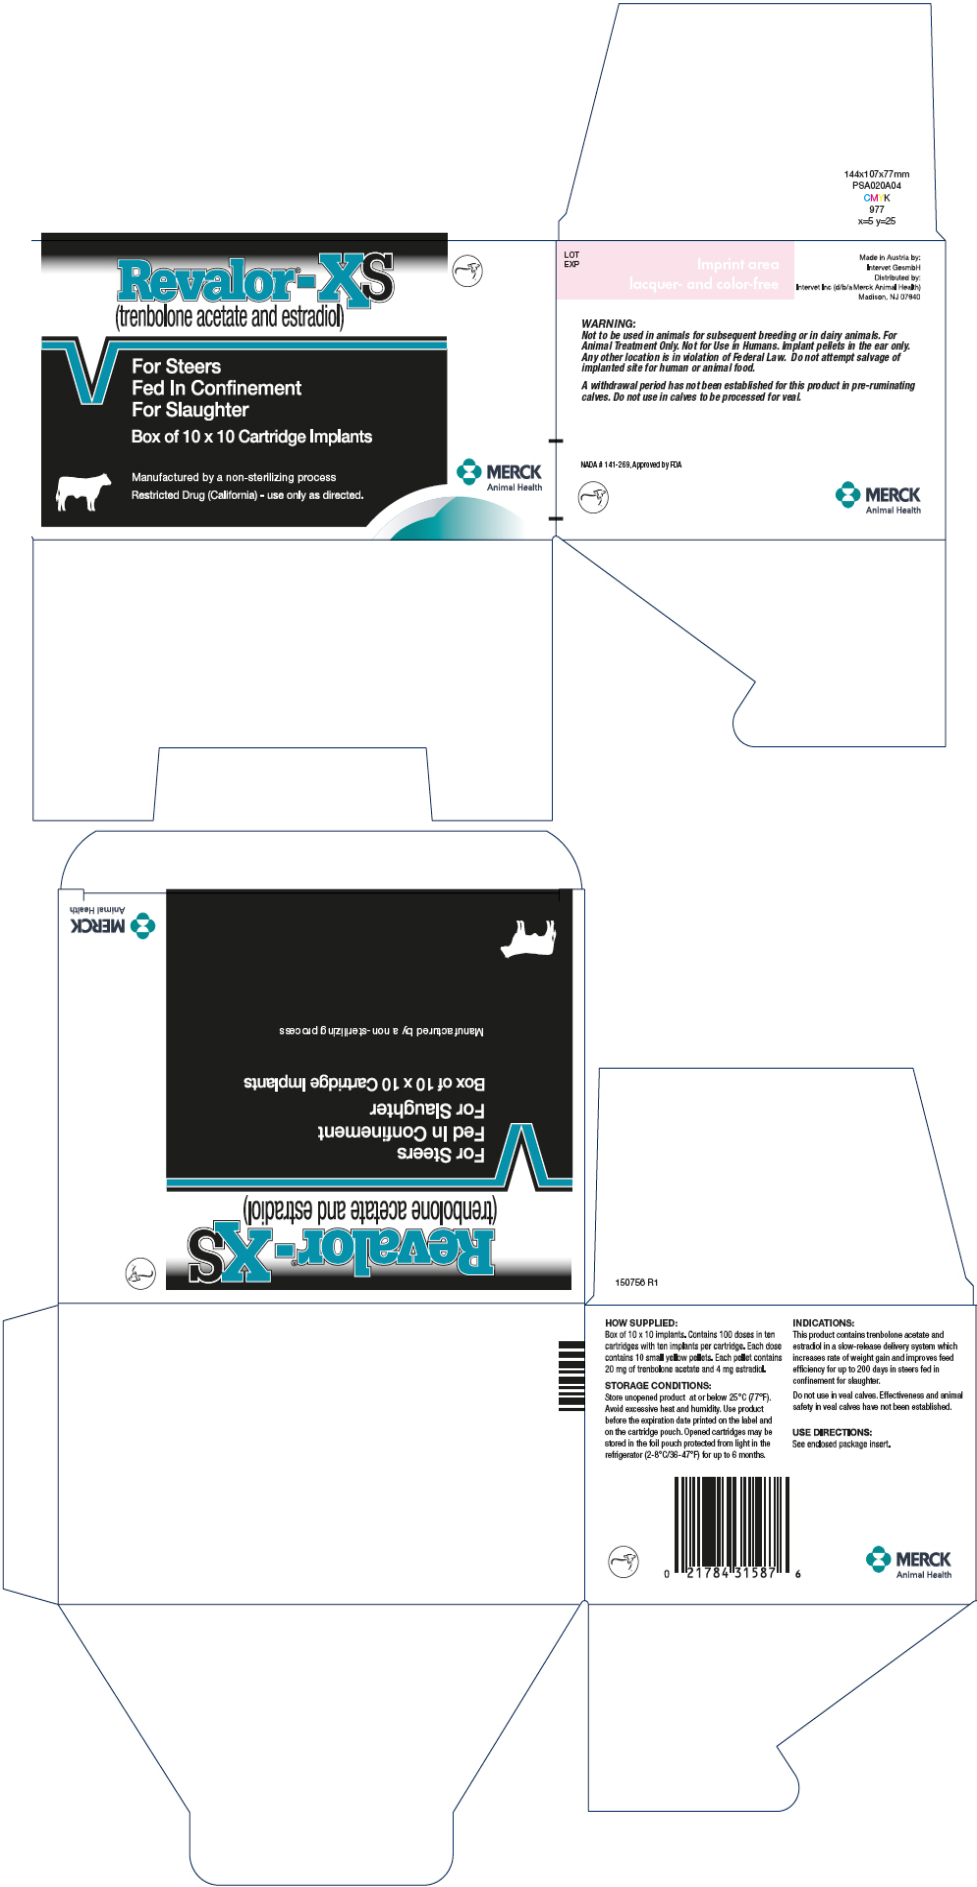 Revalor-xs (Trenbolone Acetate And Estradiol) Implant [Merck Sharp & Dohme Corp.]